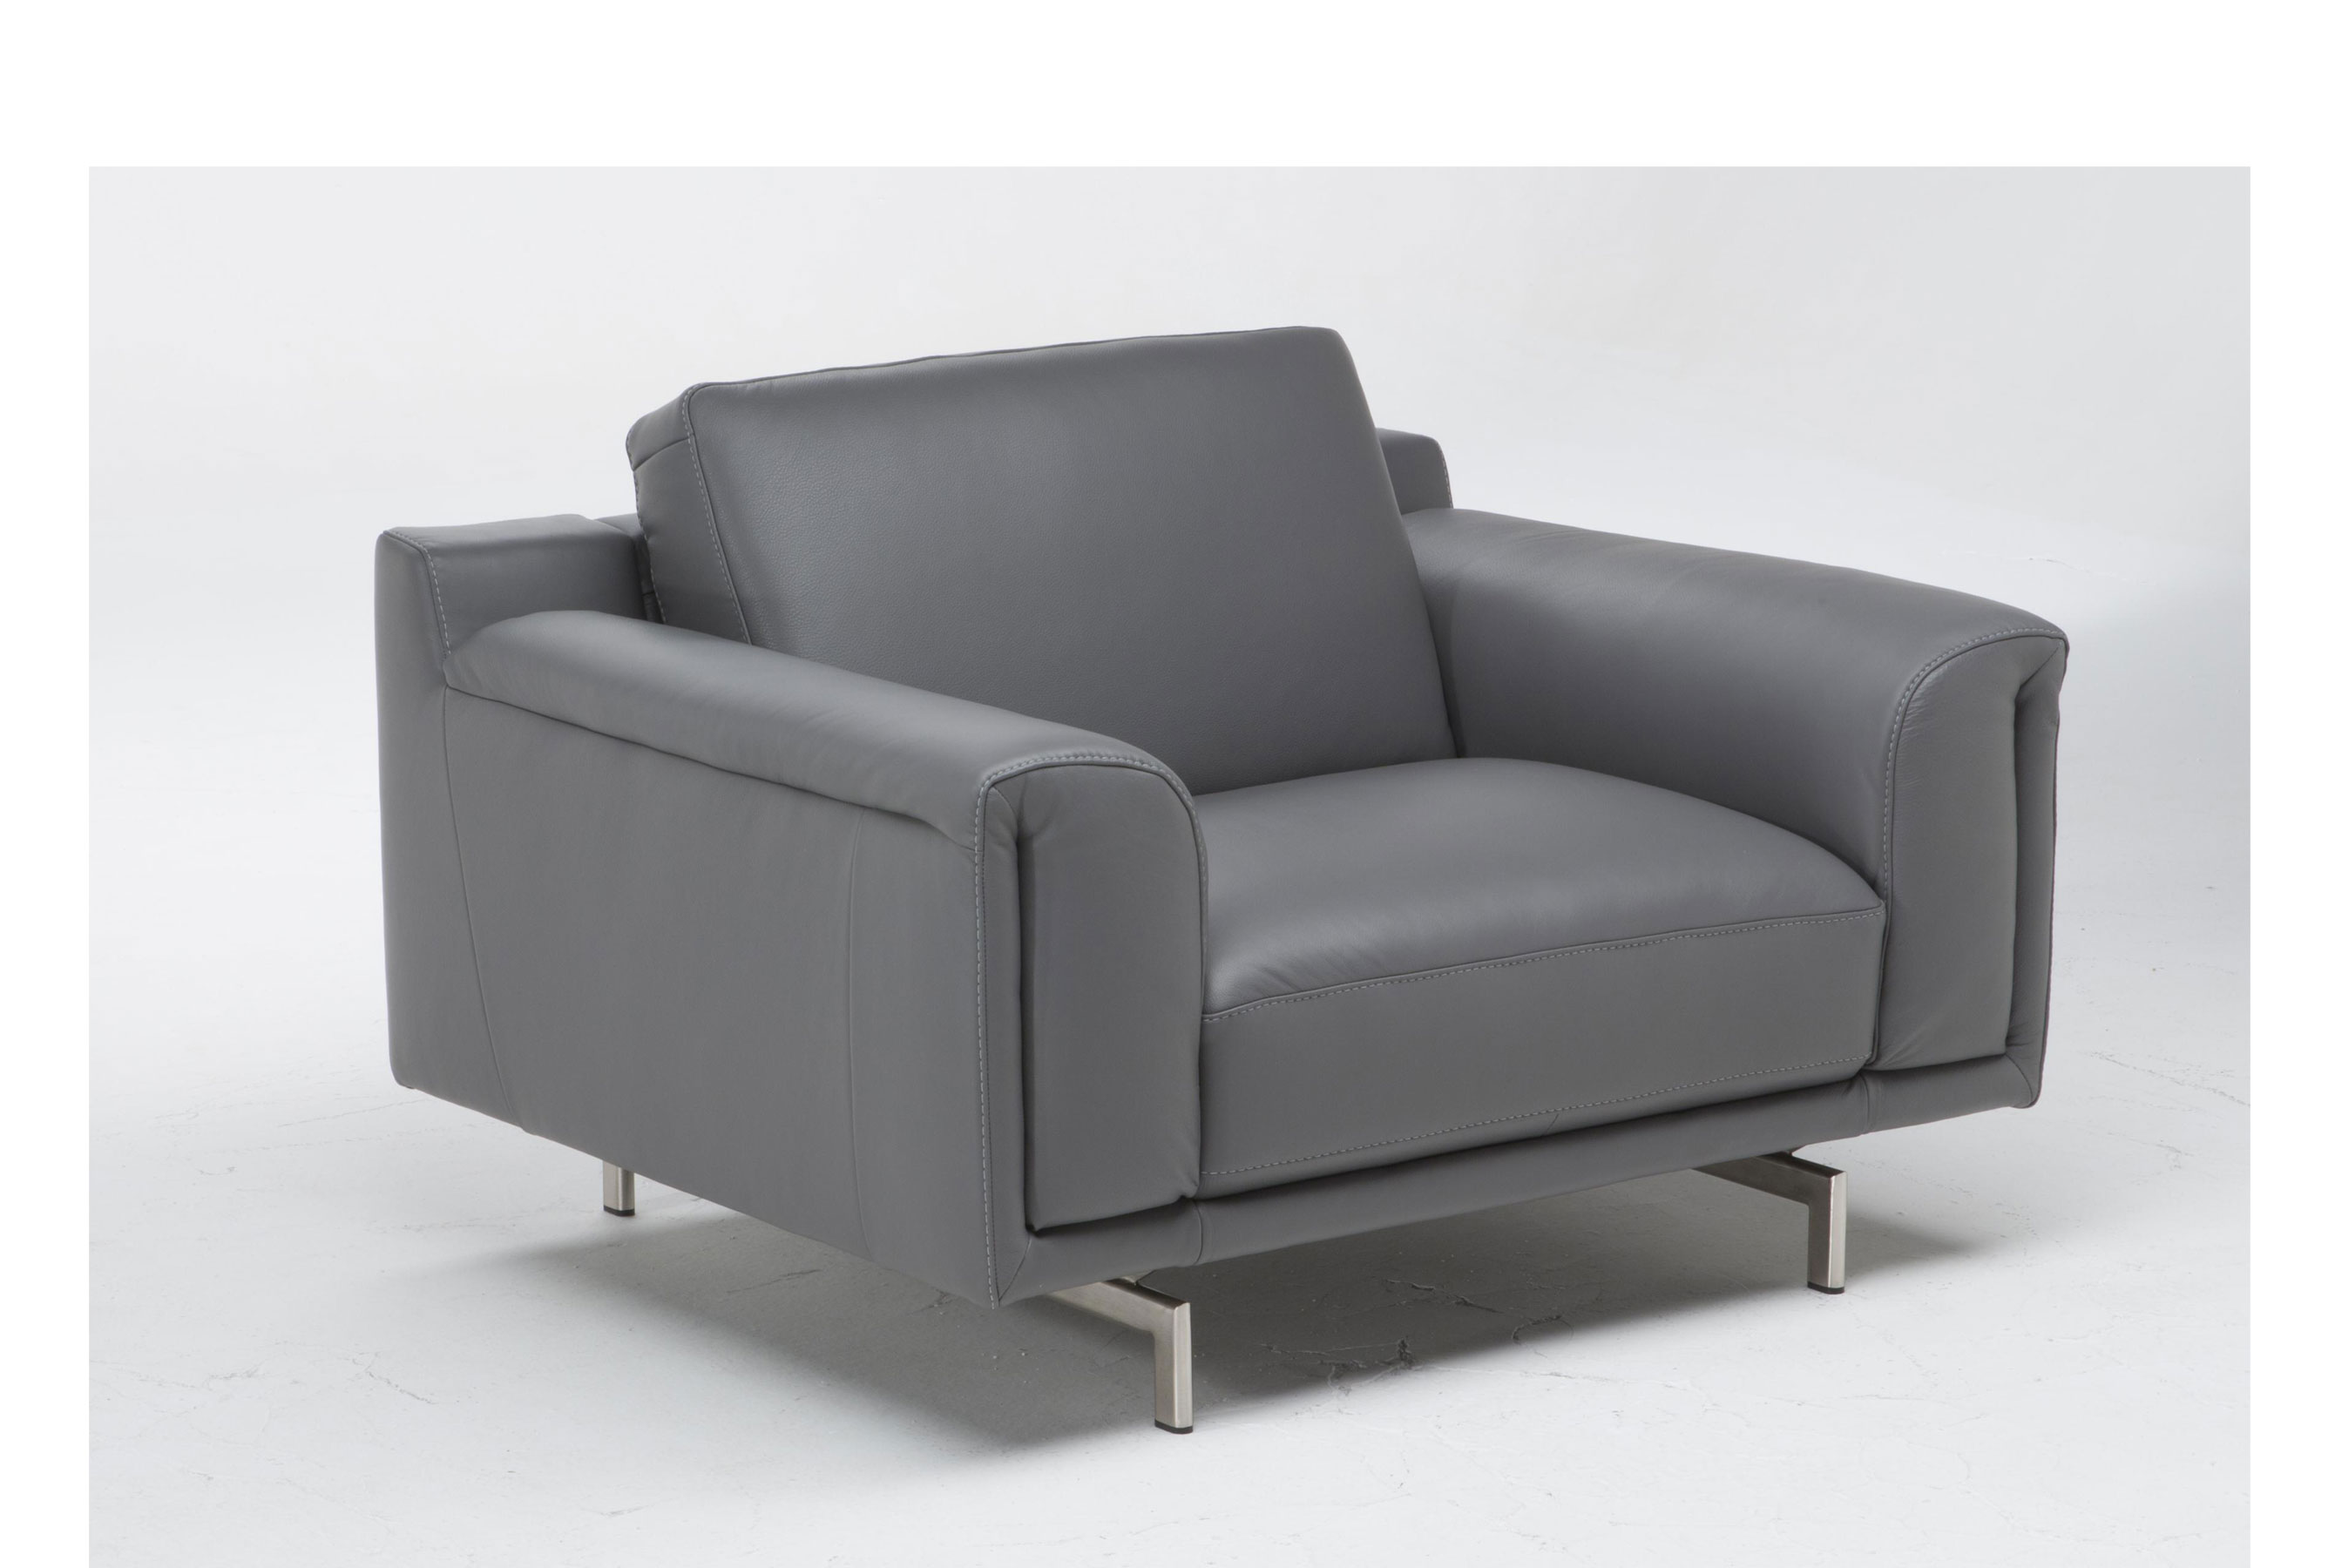 Prime Entusiasmo C019 100 Top Grain Leather Sofas And Customarchery Wood Chair Design Ideas Customarcherynet